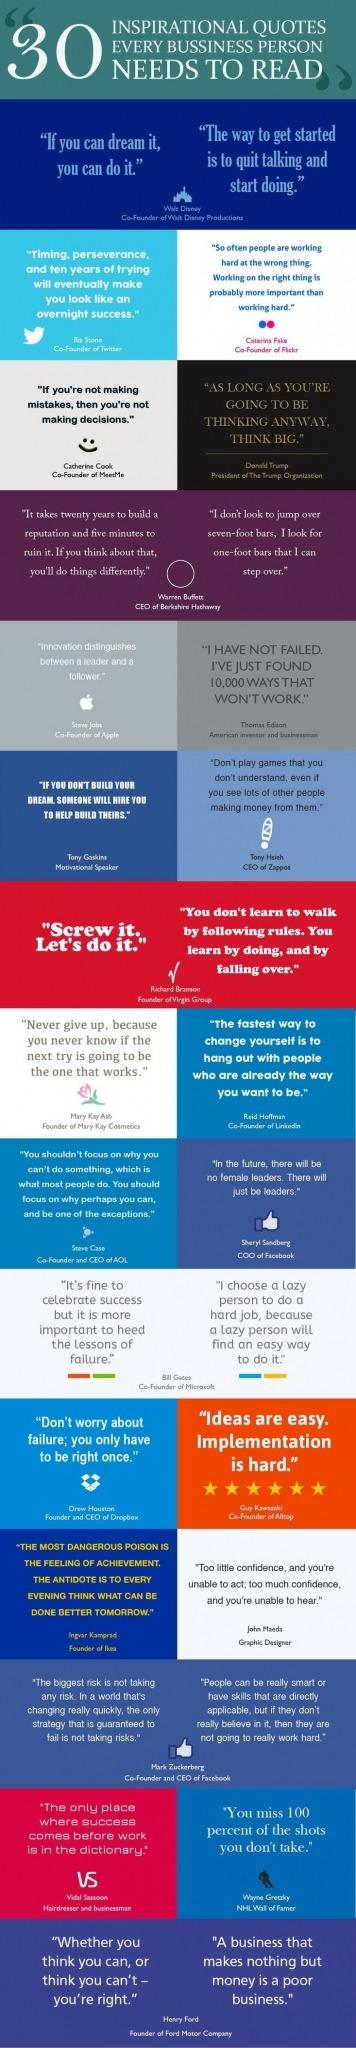 Inspirational Quotes for World Entrepreneurs